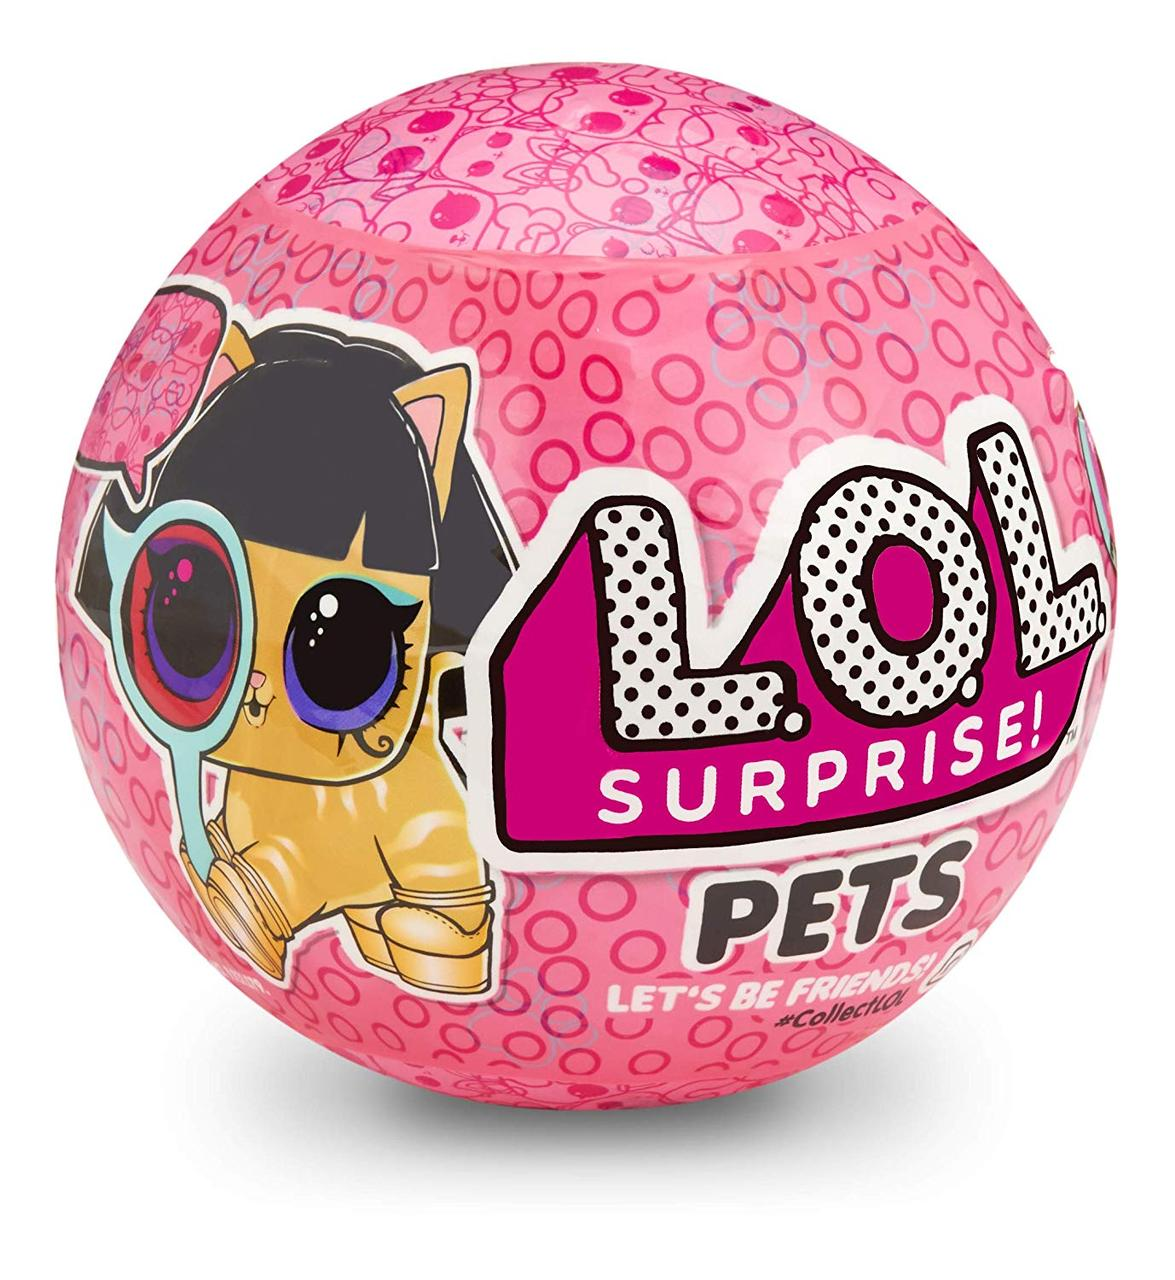 Кукла Лол Питомцы S4 шпионы декодер 2 волна L.O.L. Surprise! Pets Ball Series 4 Collectible